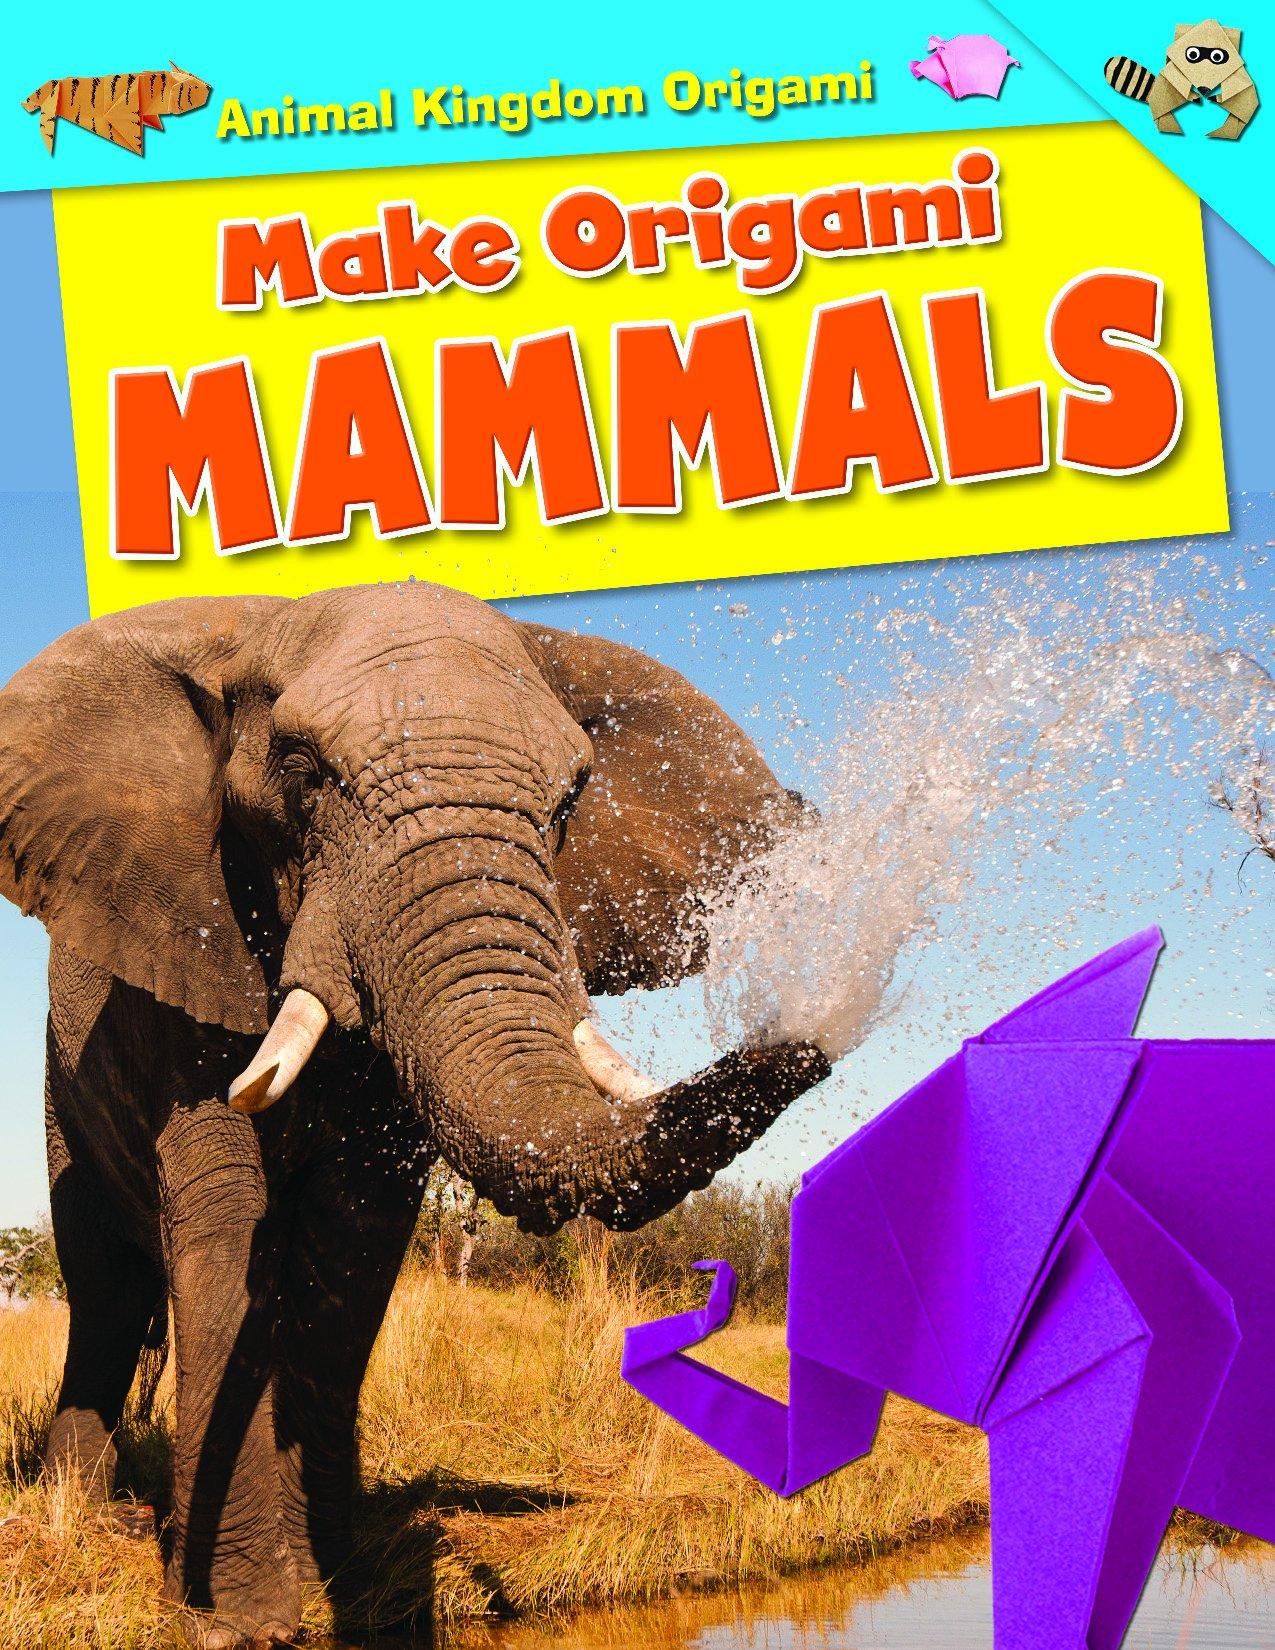 Make Origami Mammals (Animal Kingdom Origami) ebook